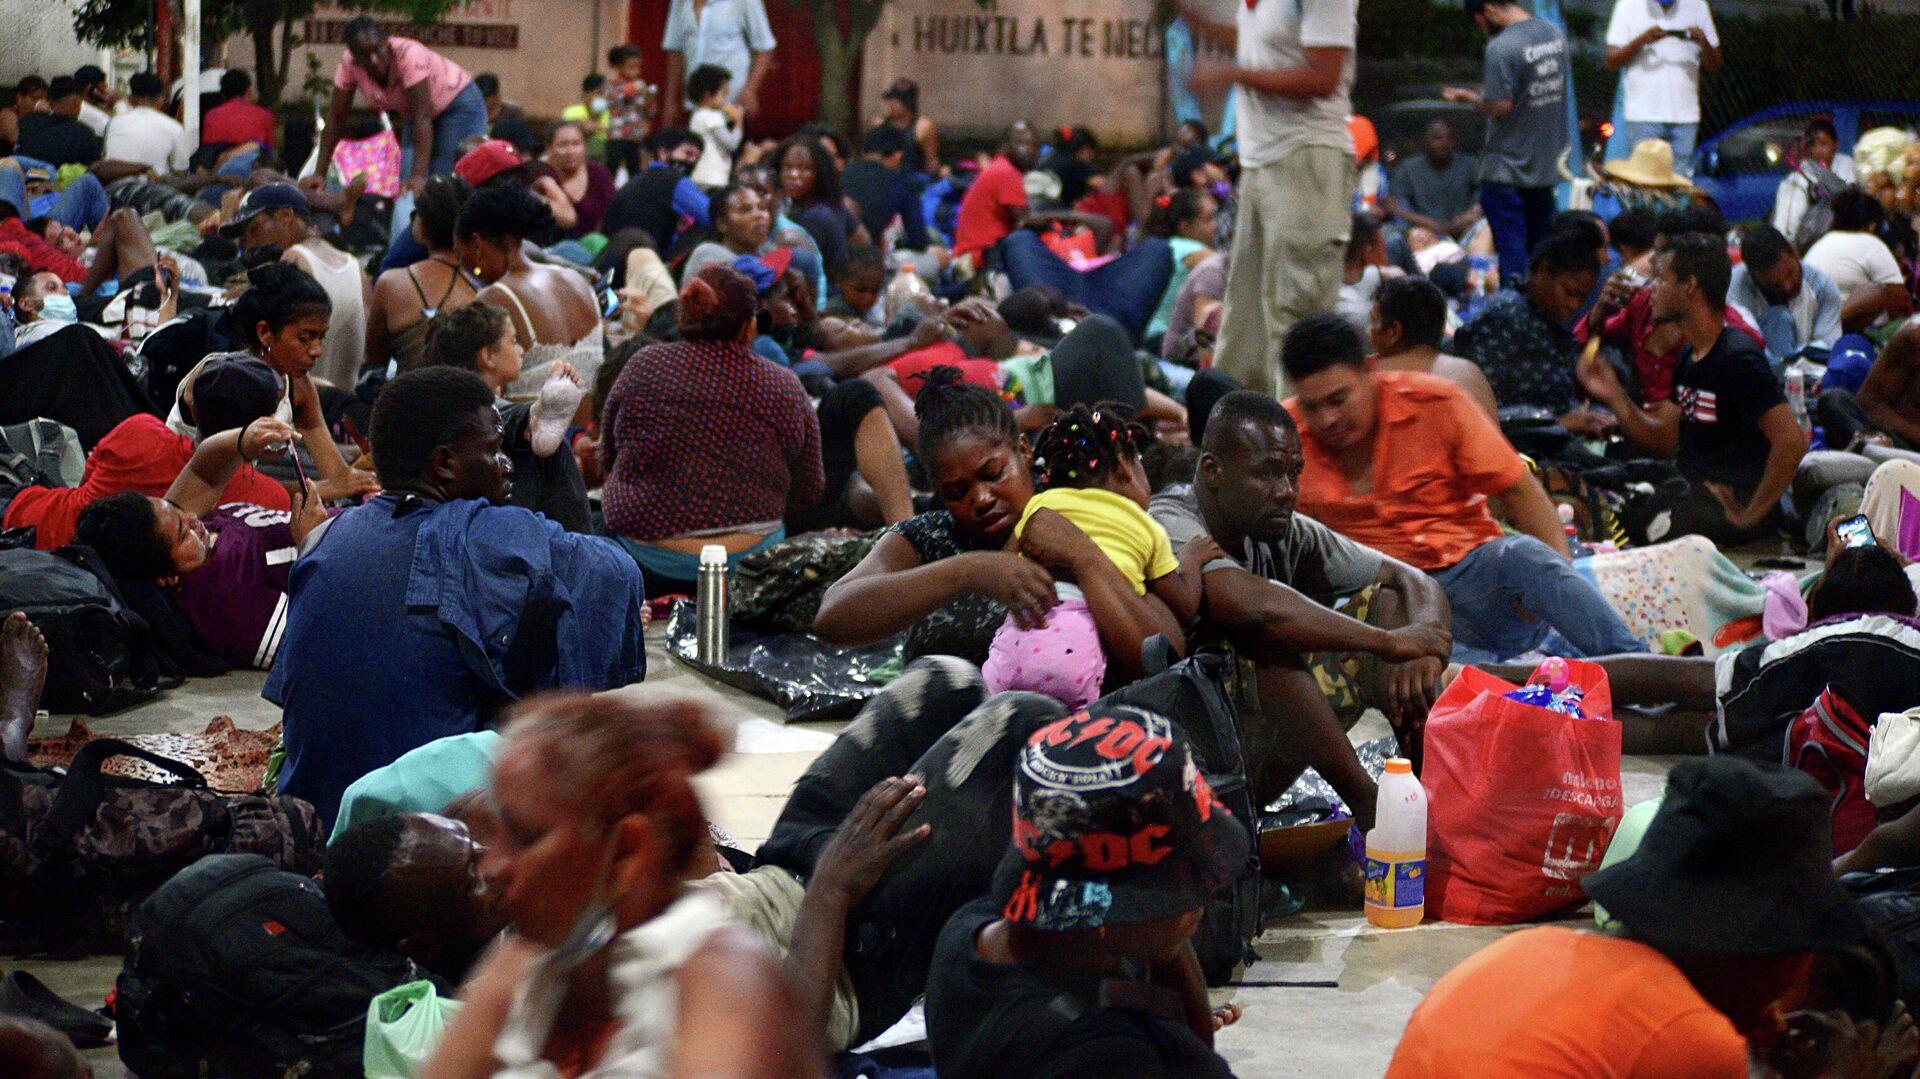 Migrantes en México - Sputnik Mundo, 1920, 08.09.2021